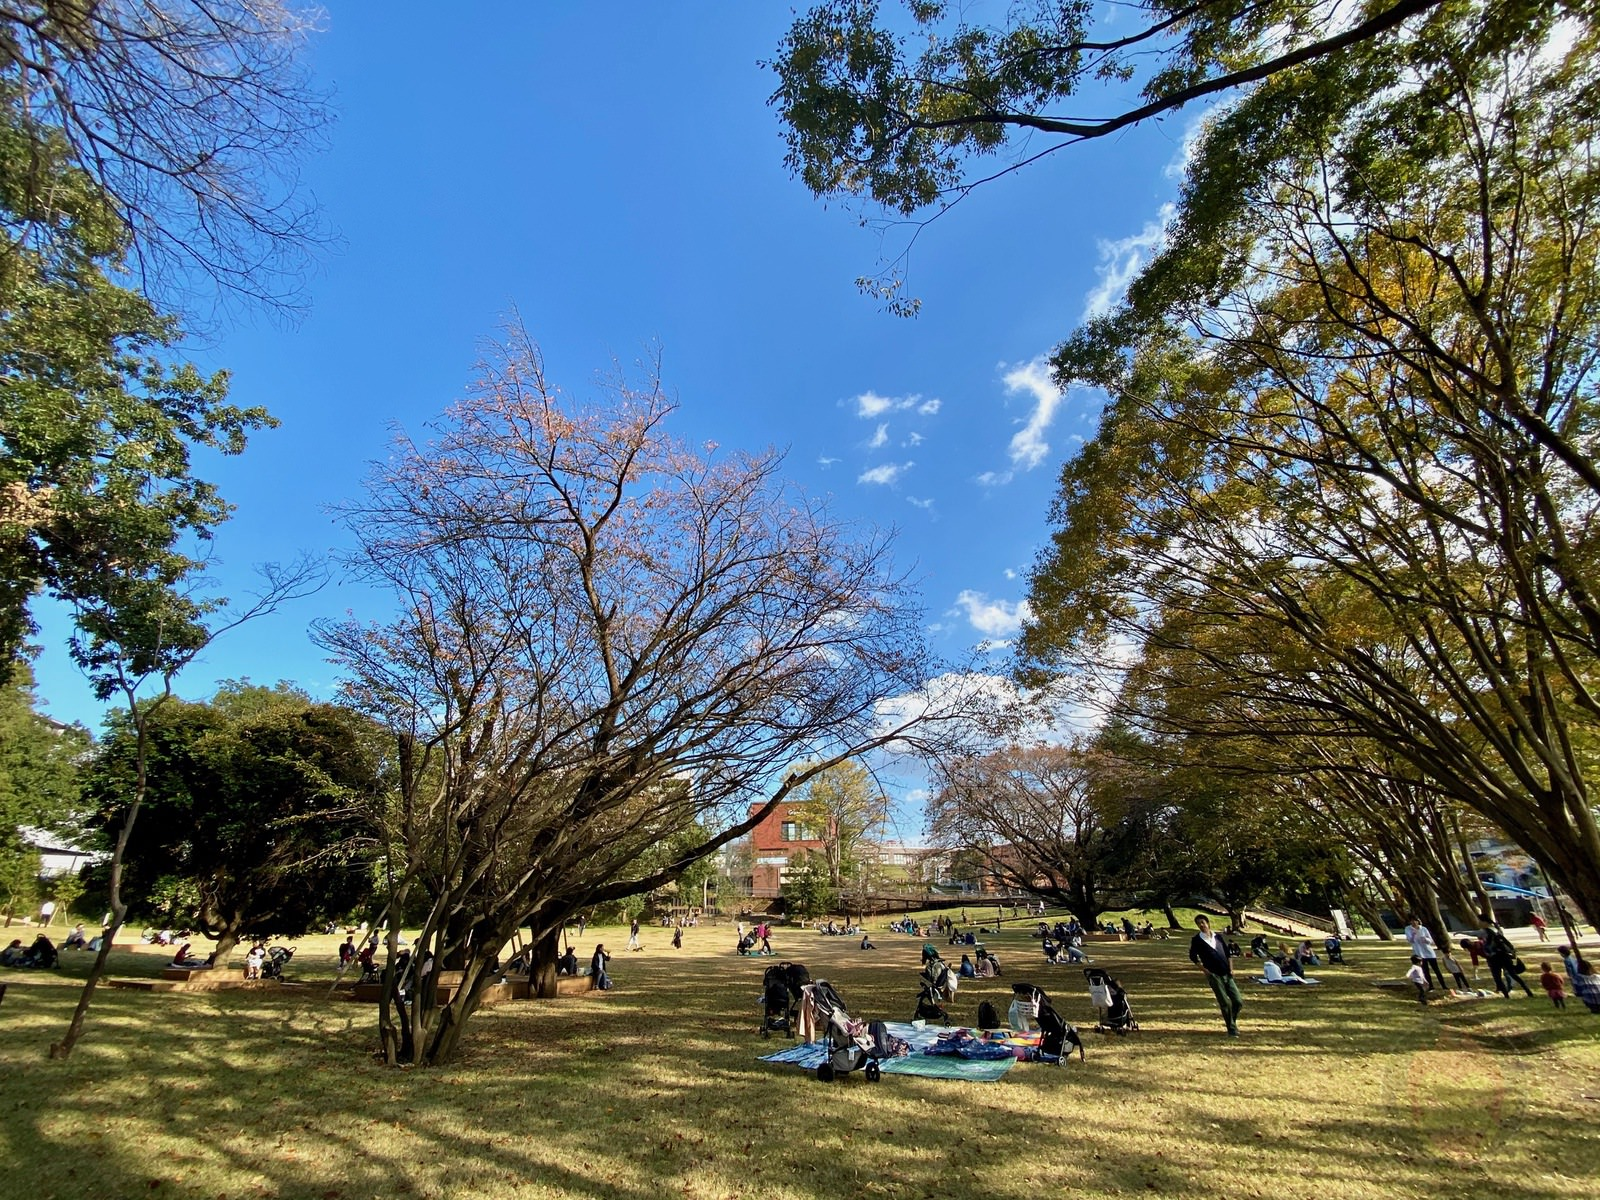 Tsuruma-Park-Minamimachid-Grandberry-Pak-01.jpeg